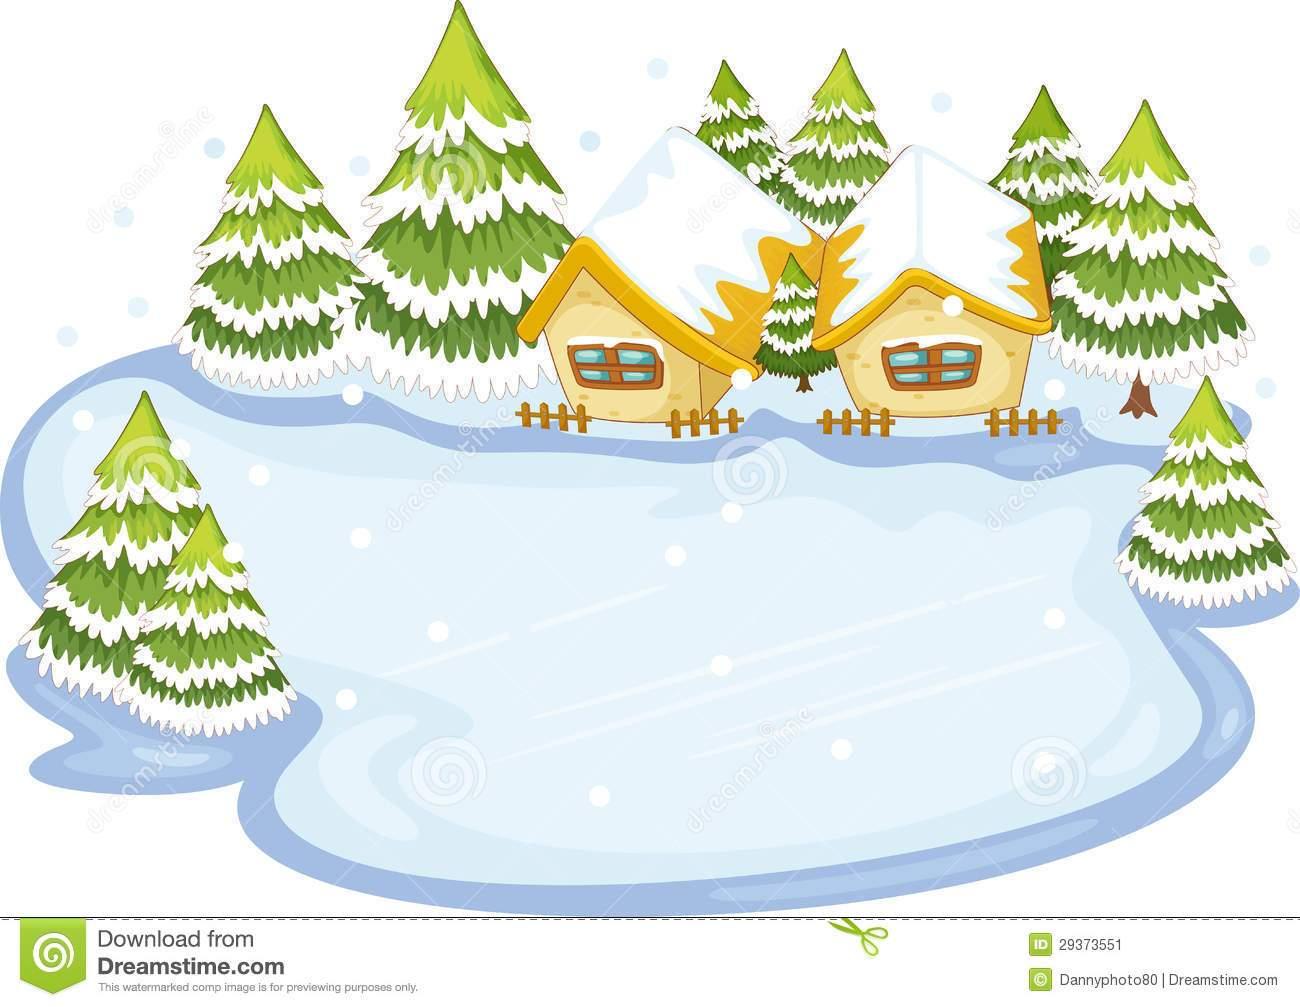 Ice pond clipart 8 » Clipart Portal.